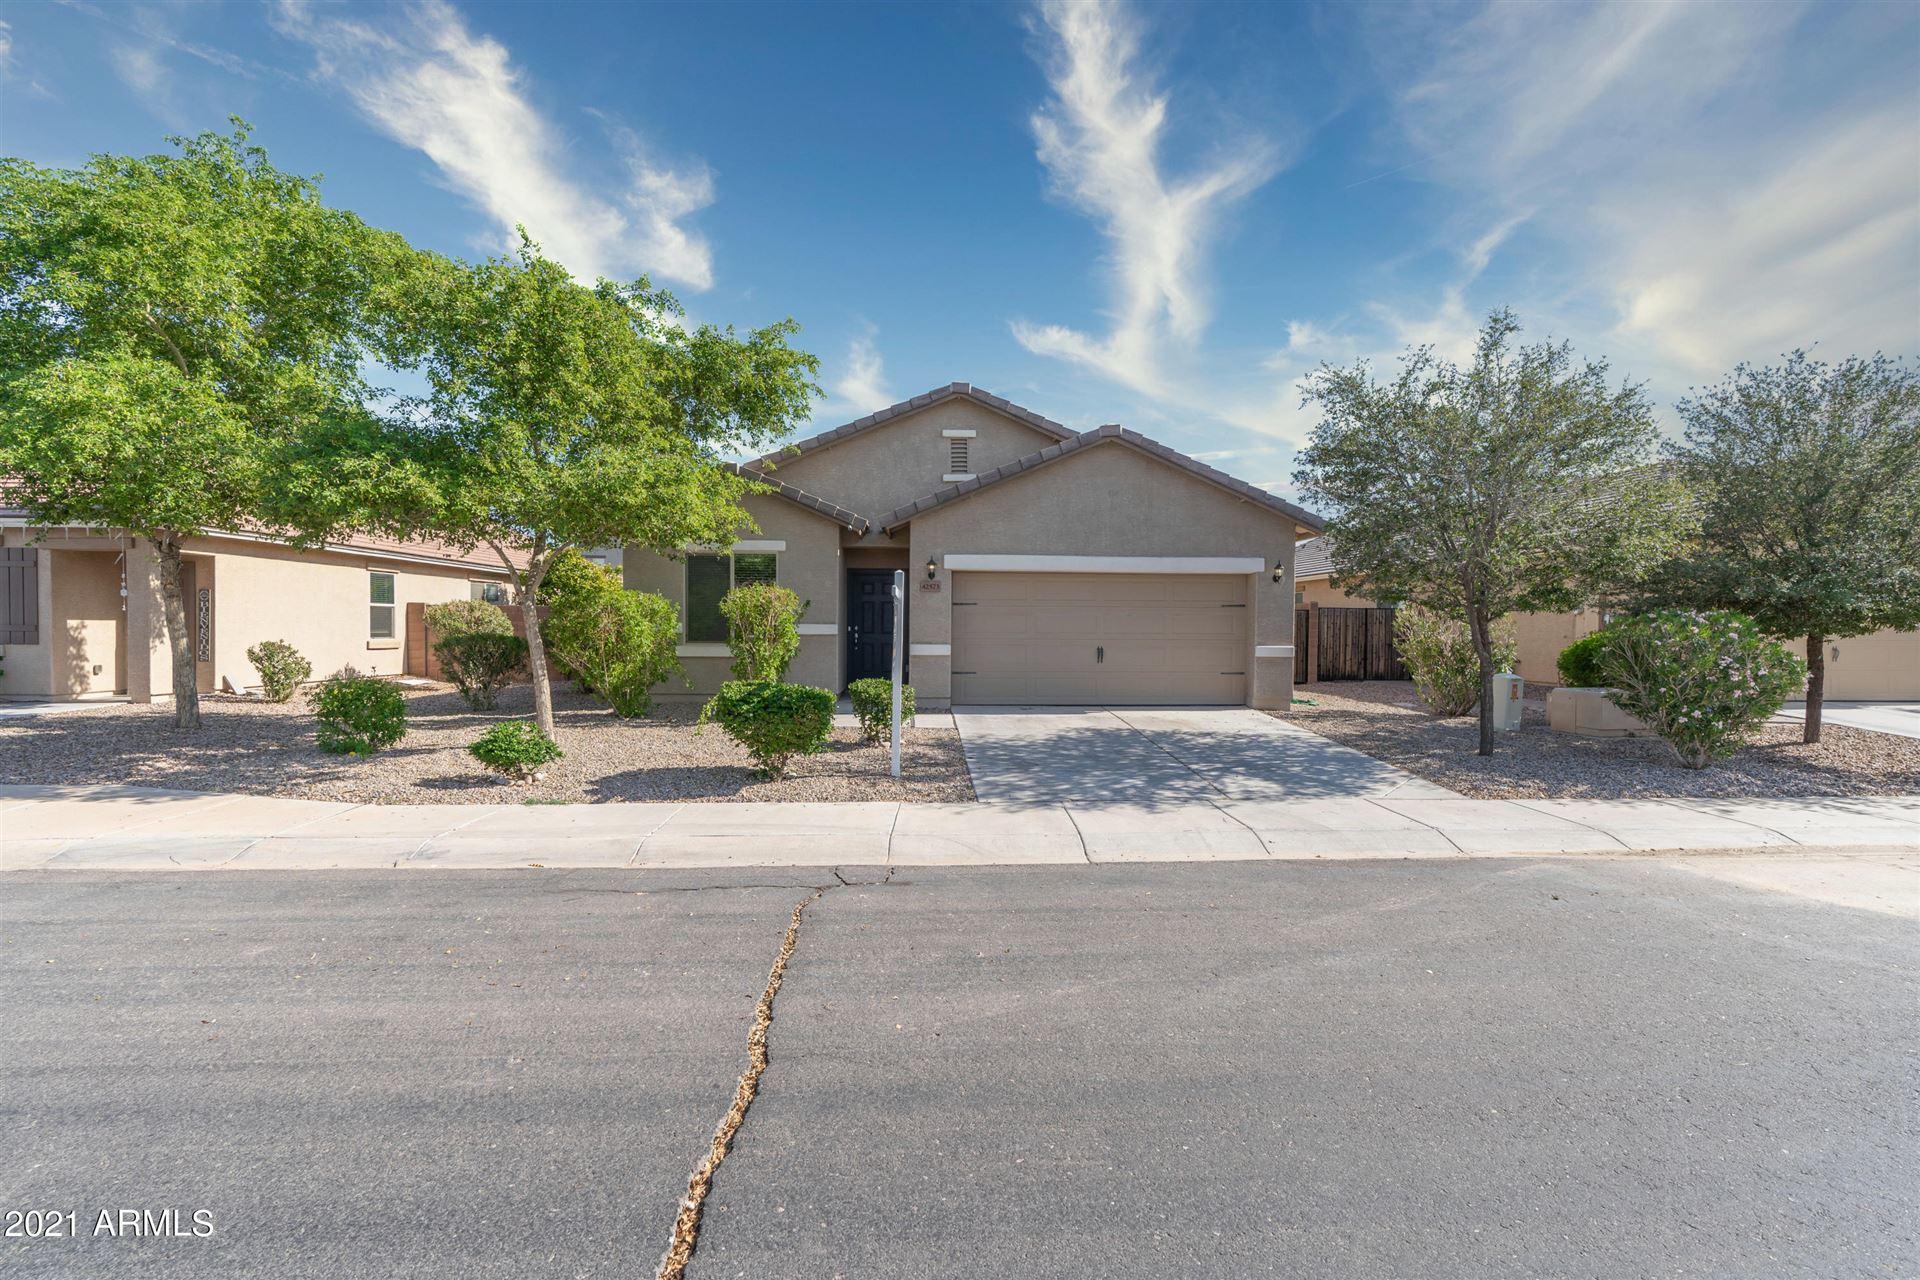 Photo for 42573 W Sussex Road, Maricopa, AZ 85138 (MLS # 6258049)